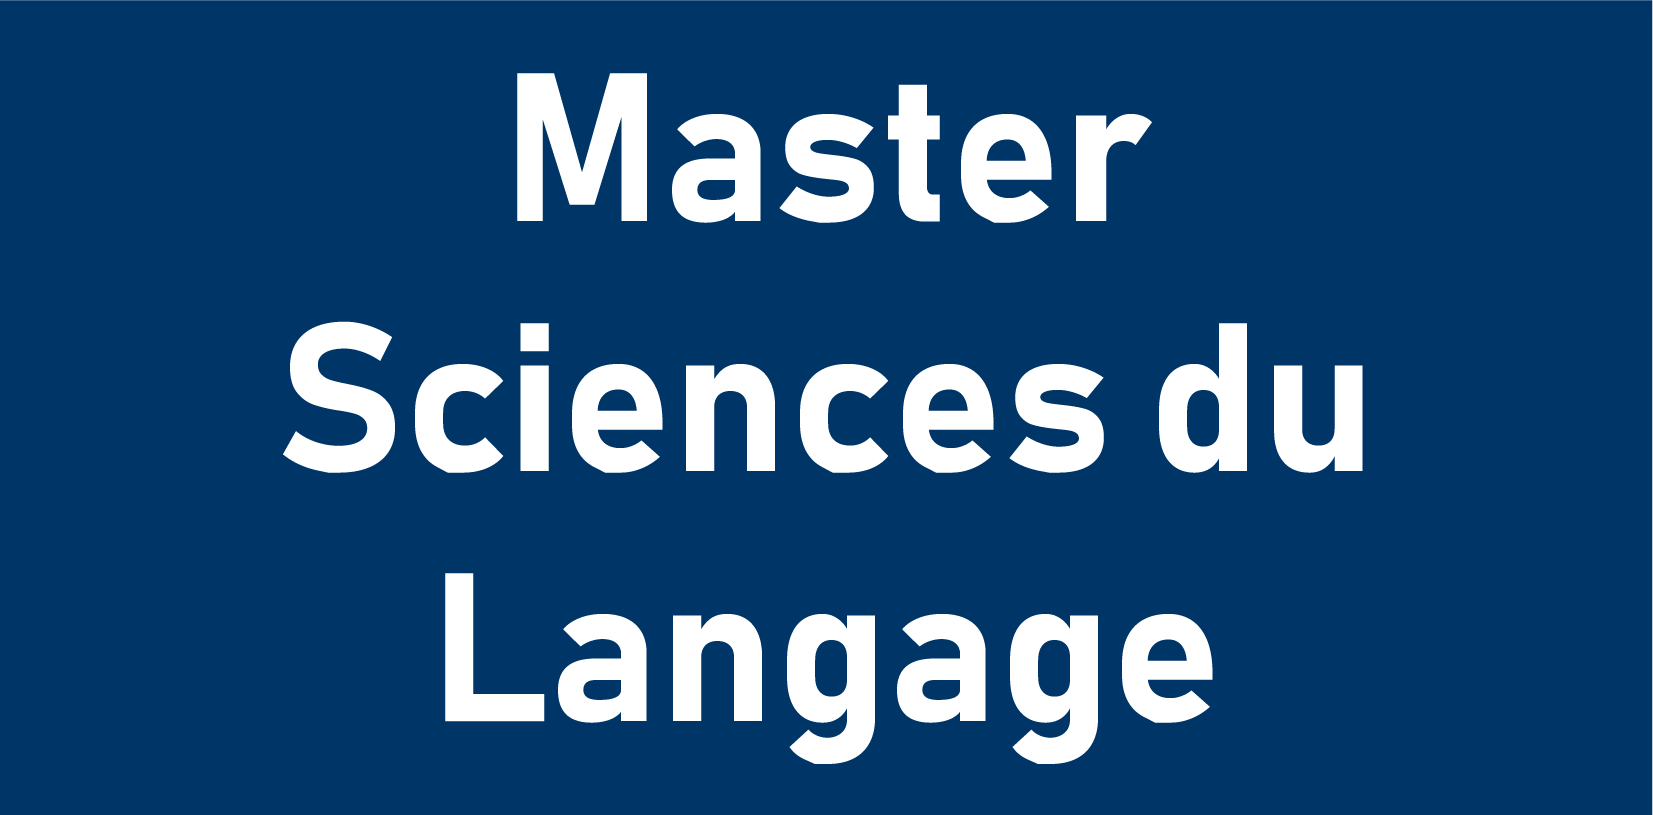 Master Sciences du Langage